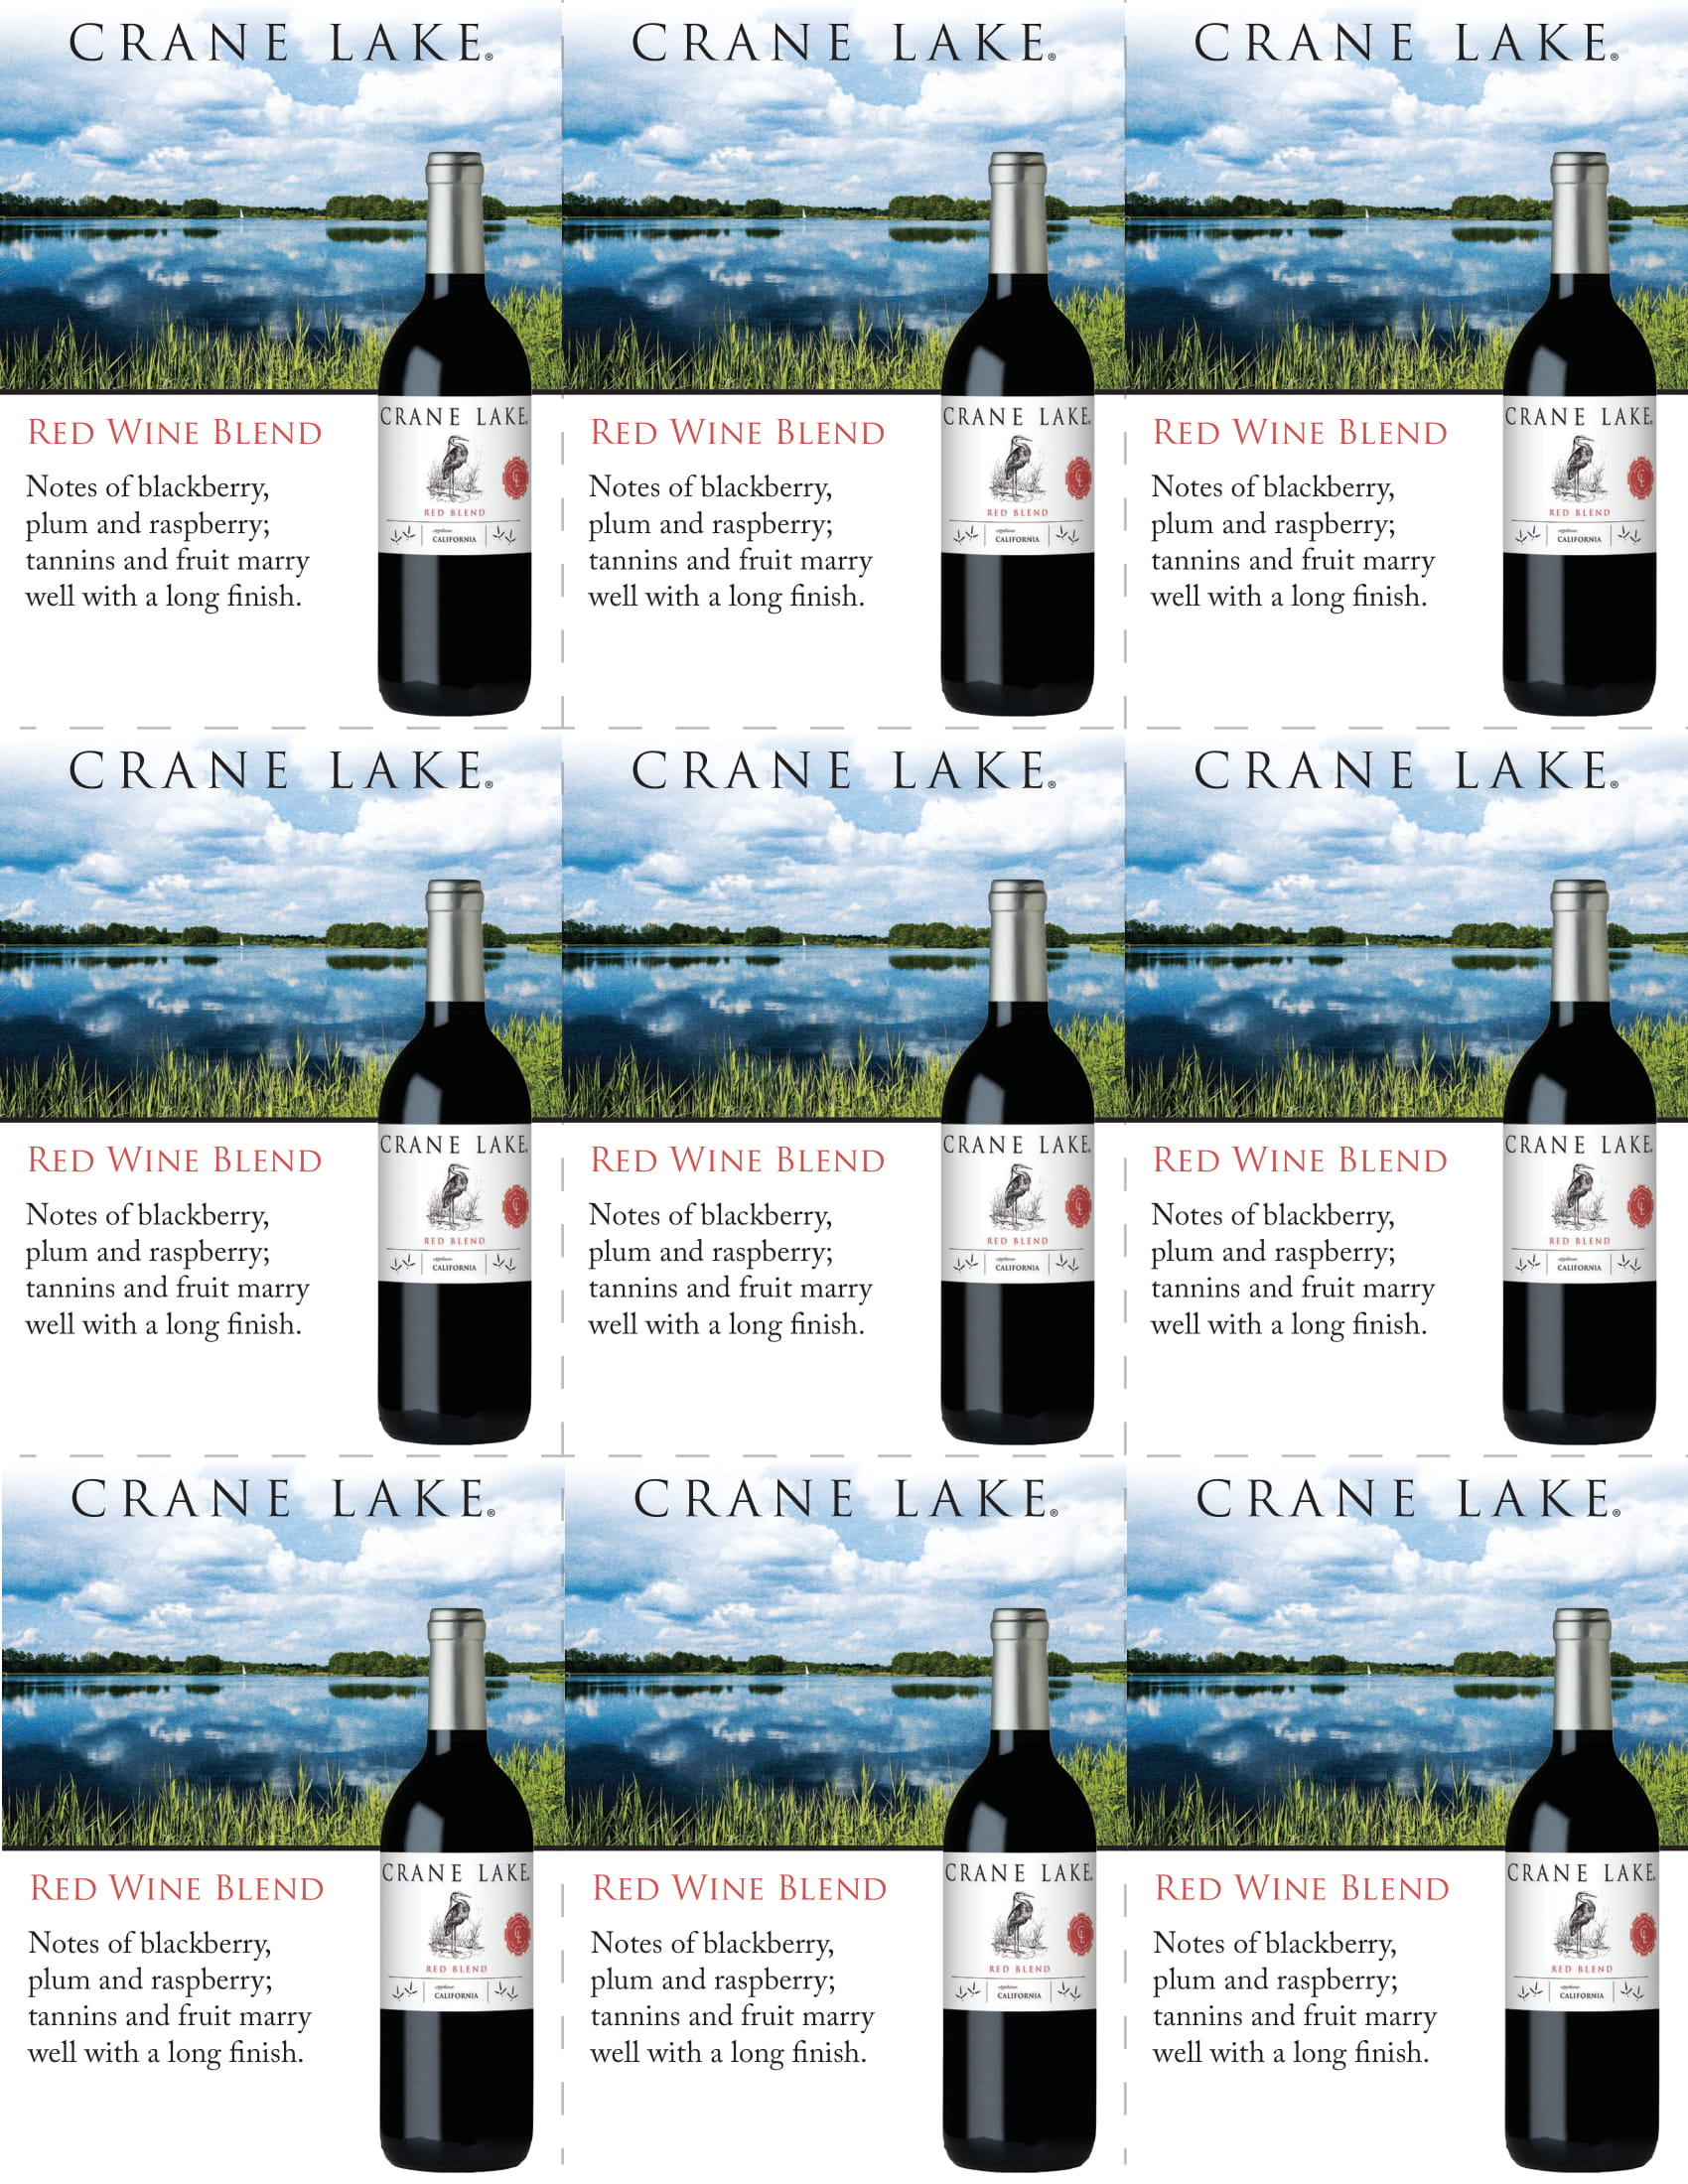 Crane Lake Red Blend Shelf Talkers